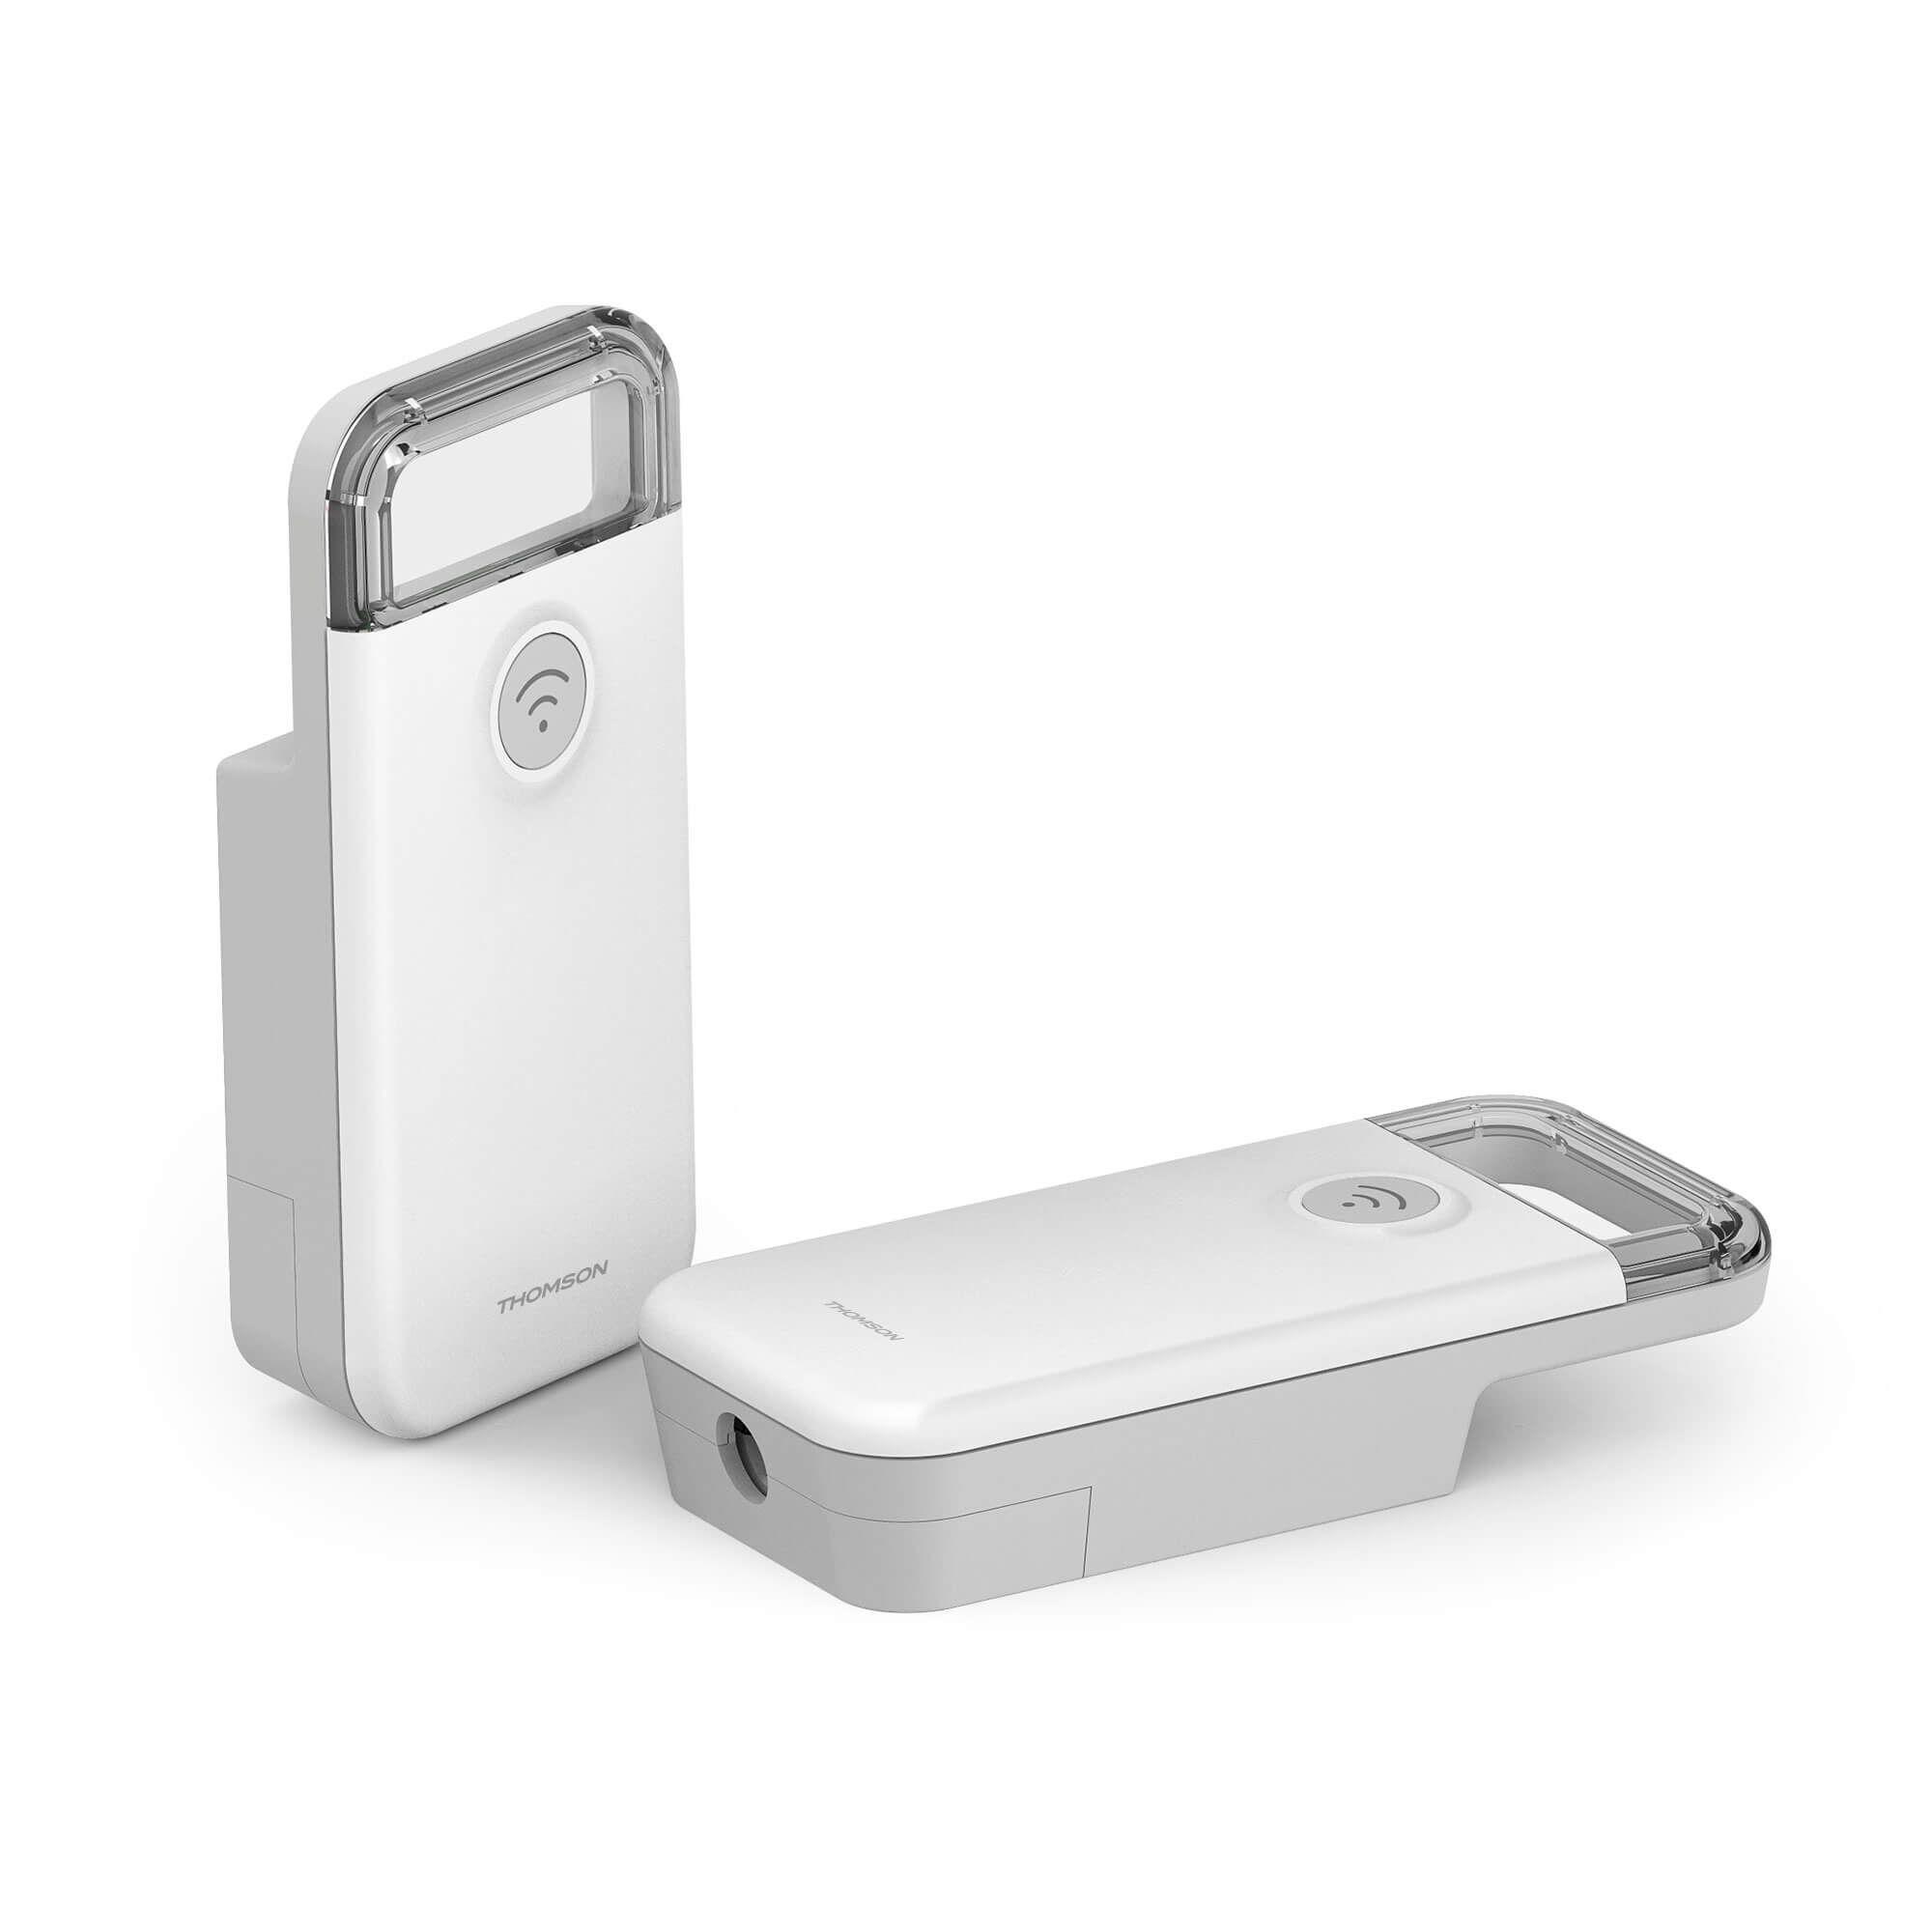 Pack de 2 Modules de chauffage Wifi pour radiateur fil pilote (520019)